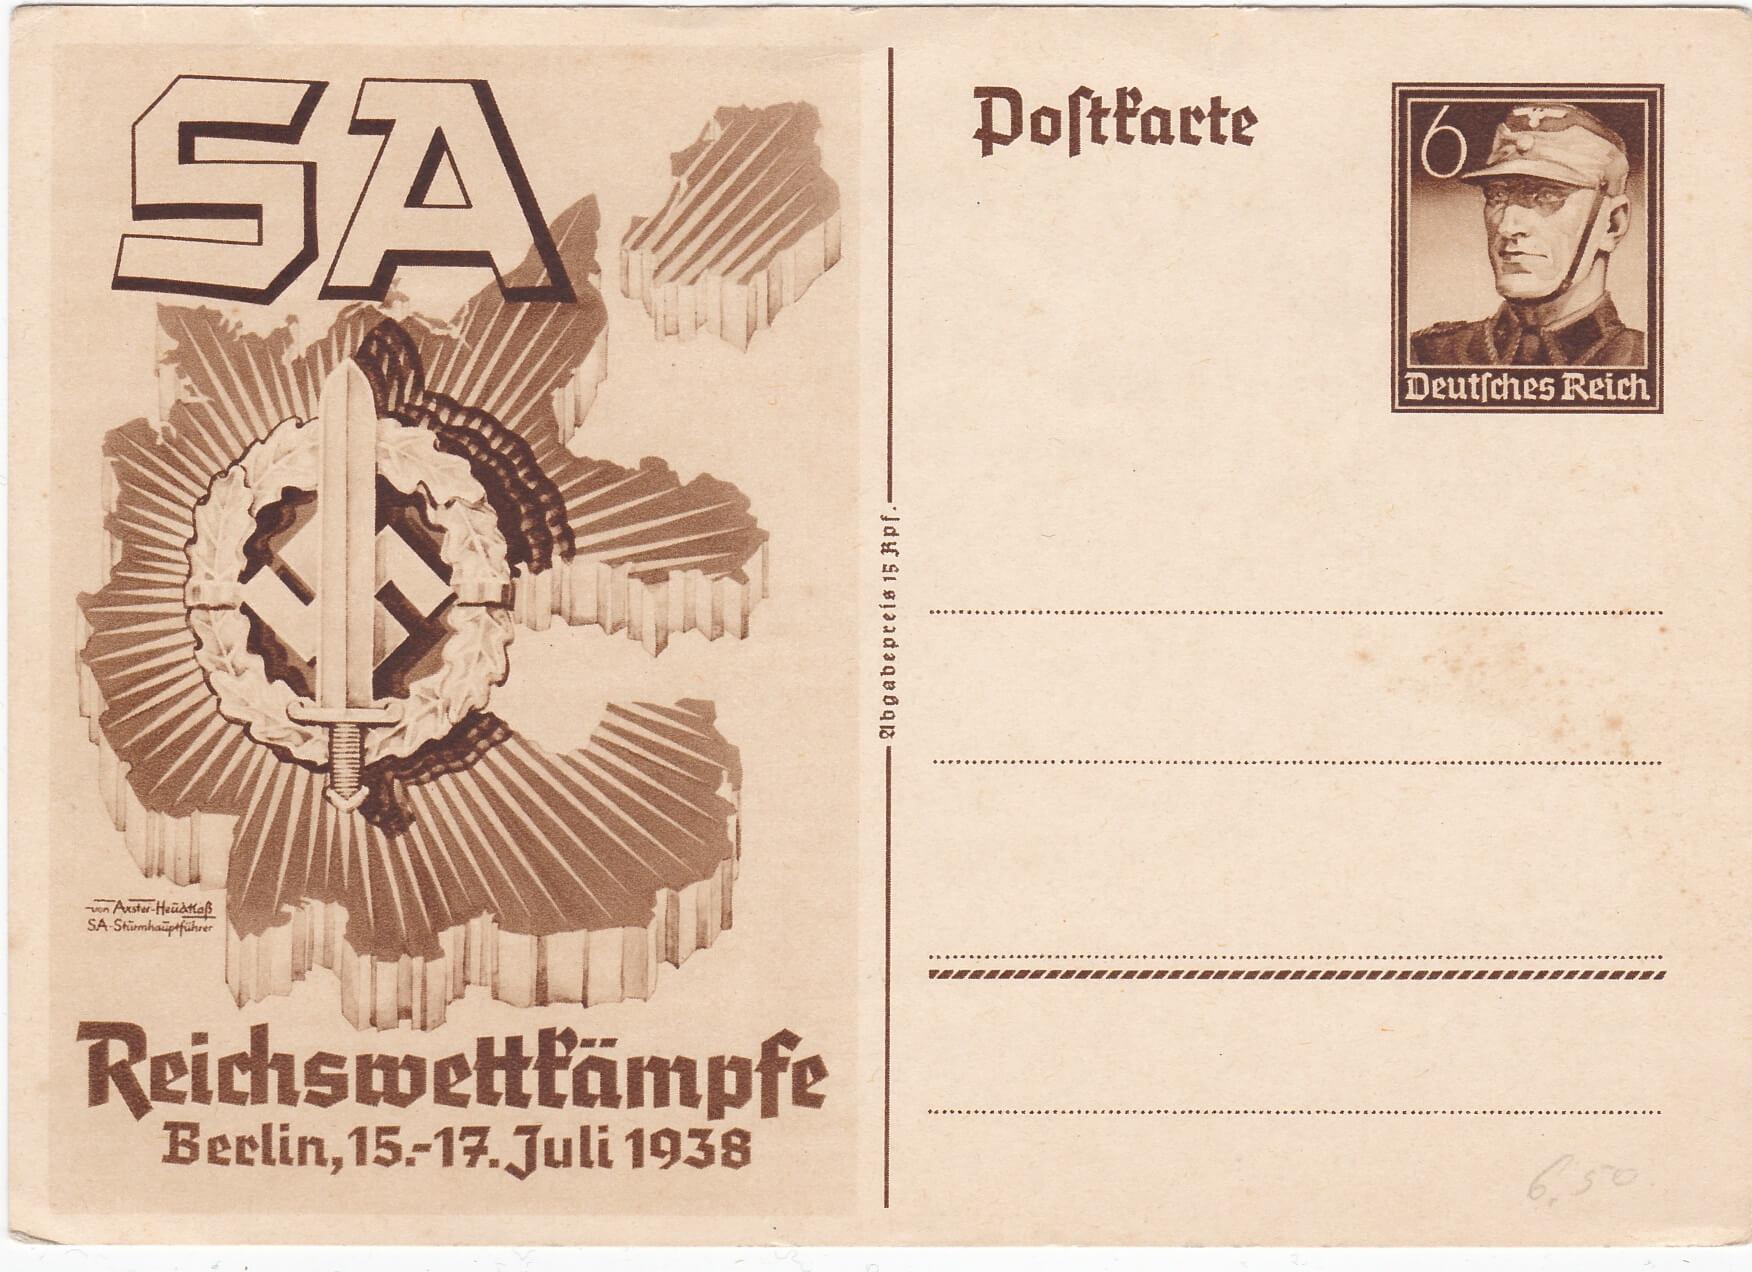 S.A. Reichswettkampfe Berlin 1938